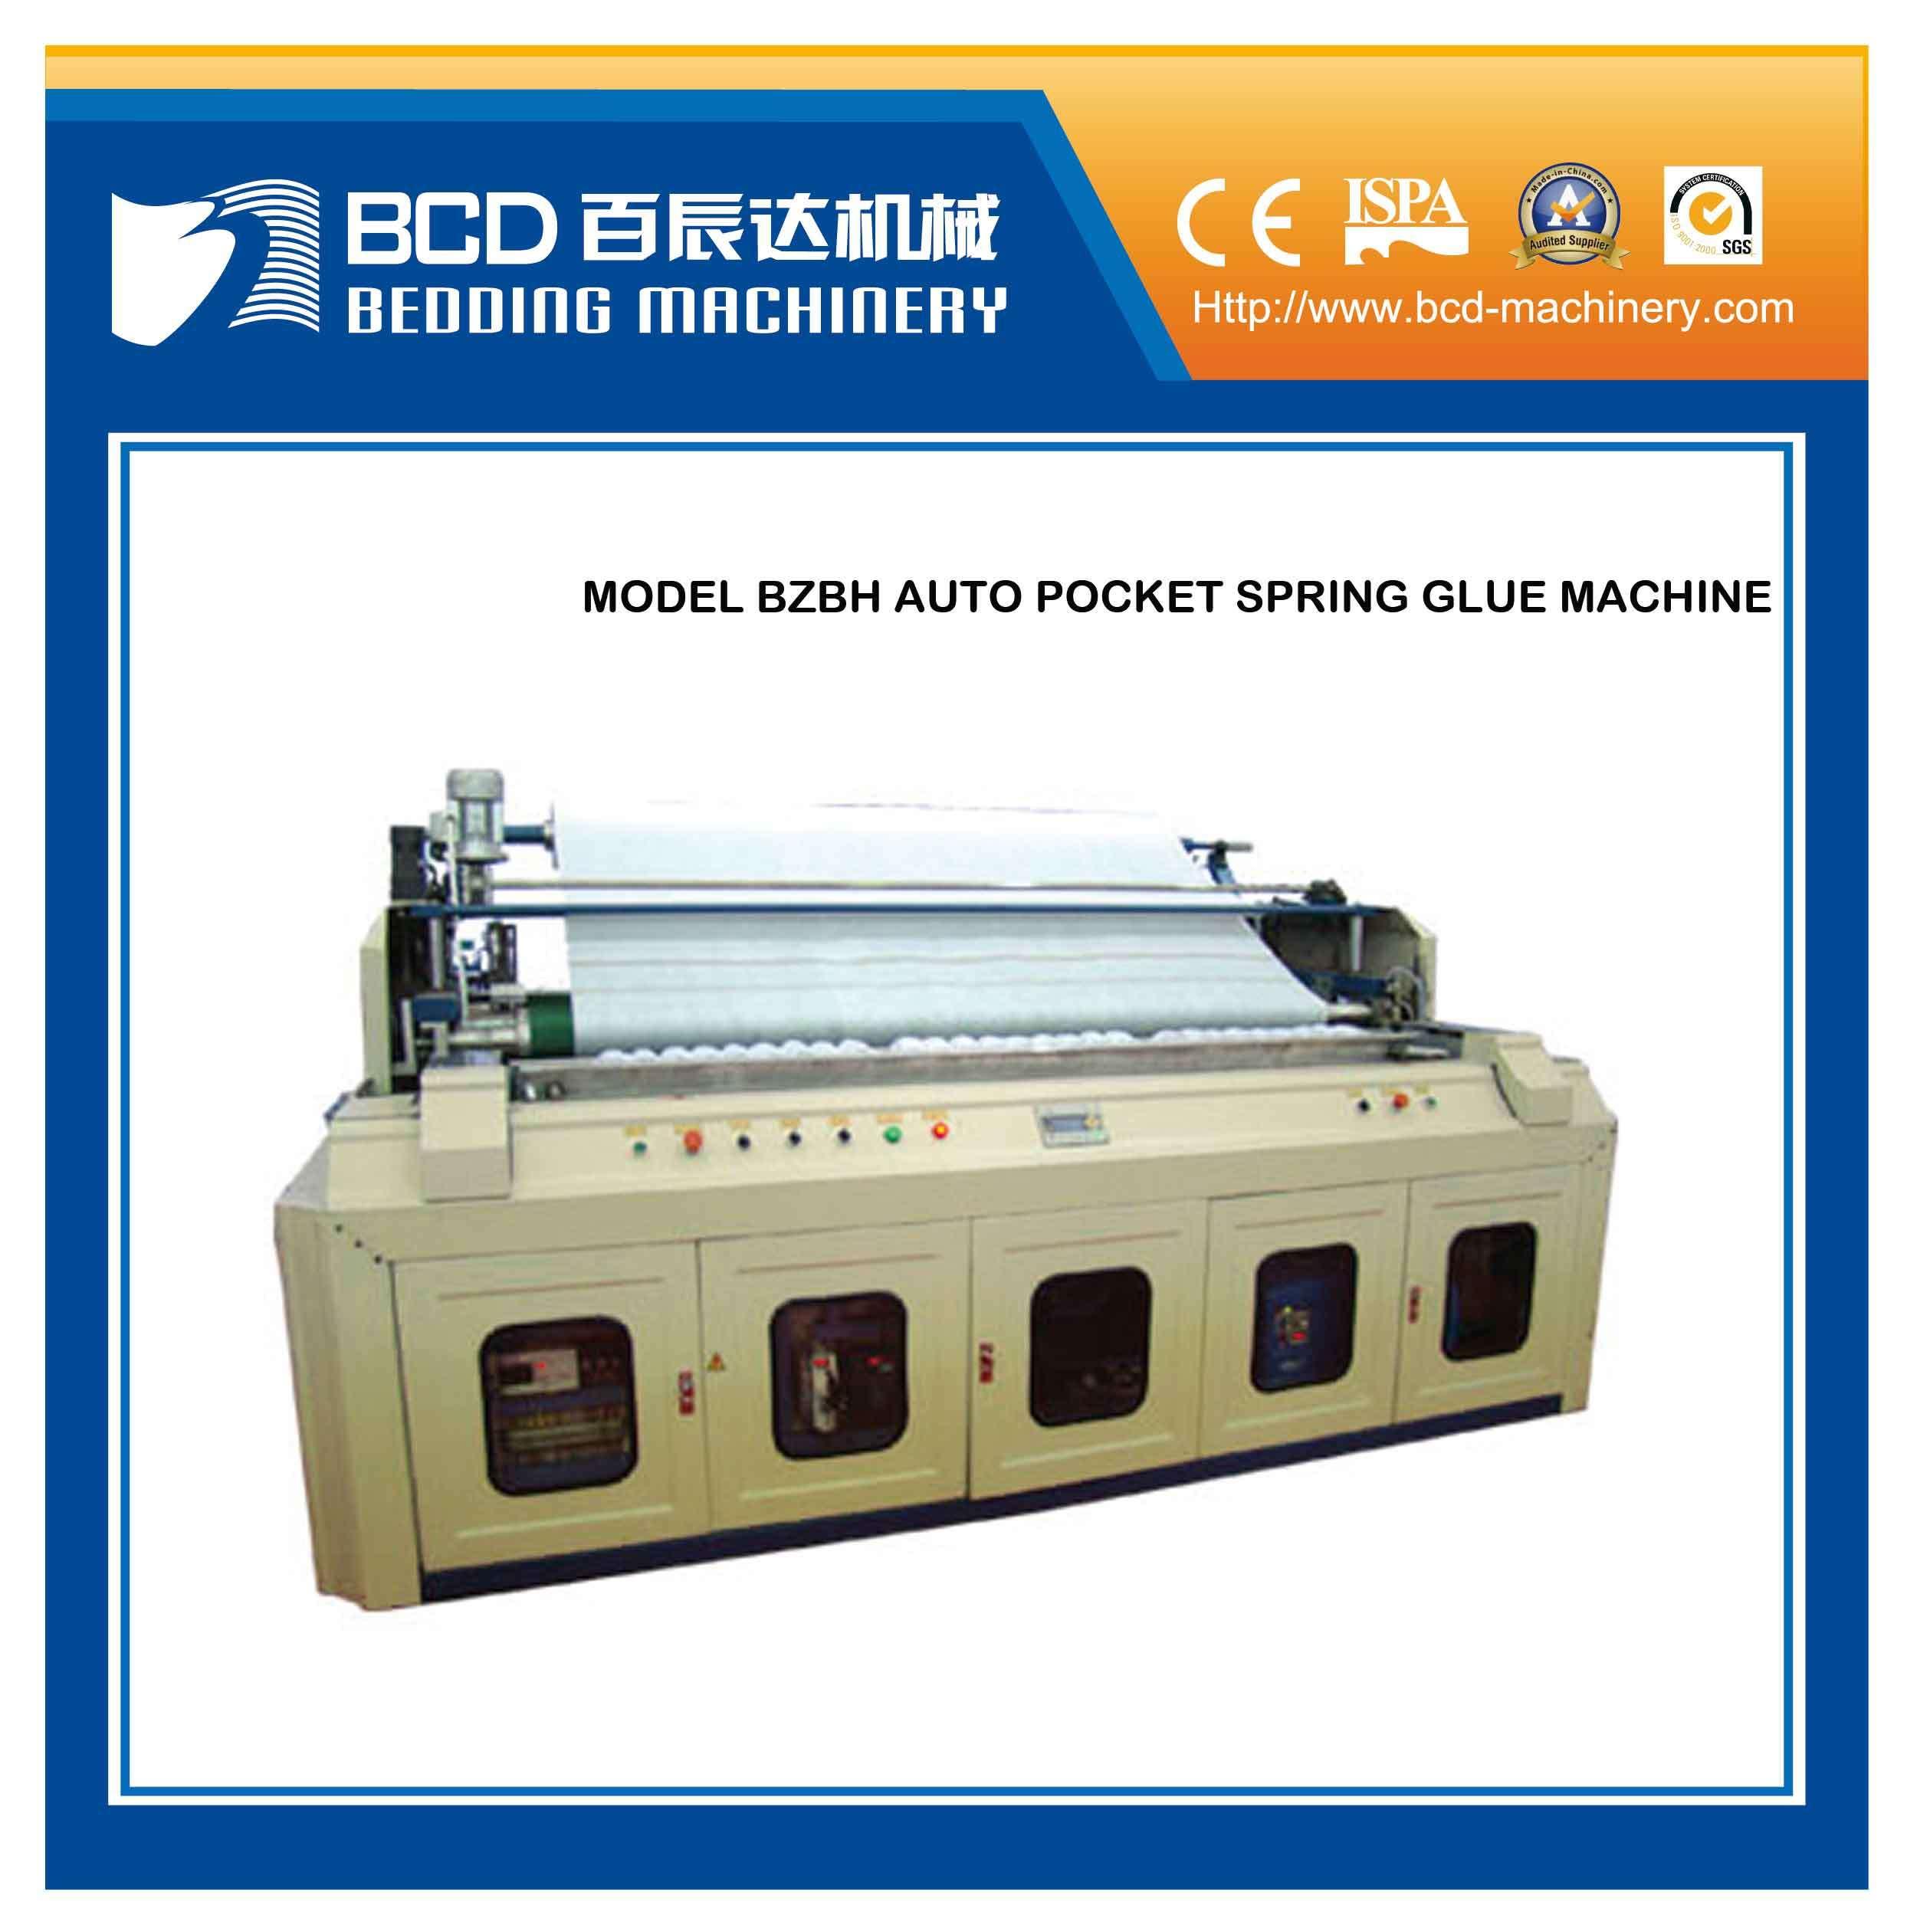 Pocket Spring Glue Assembling Machine (BZBH)